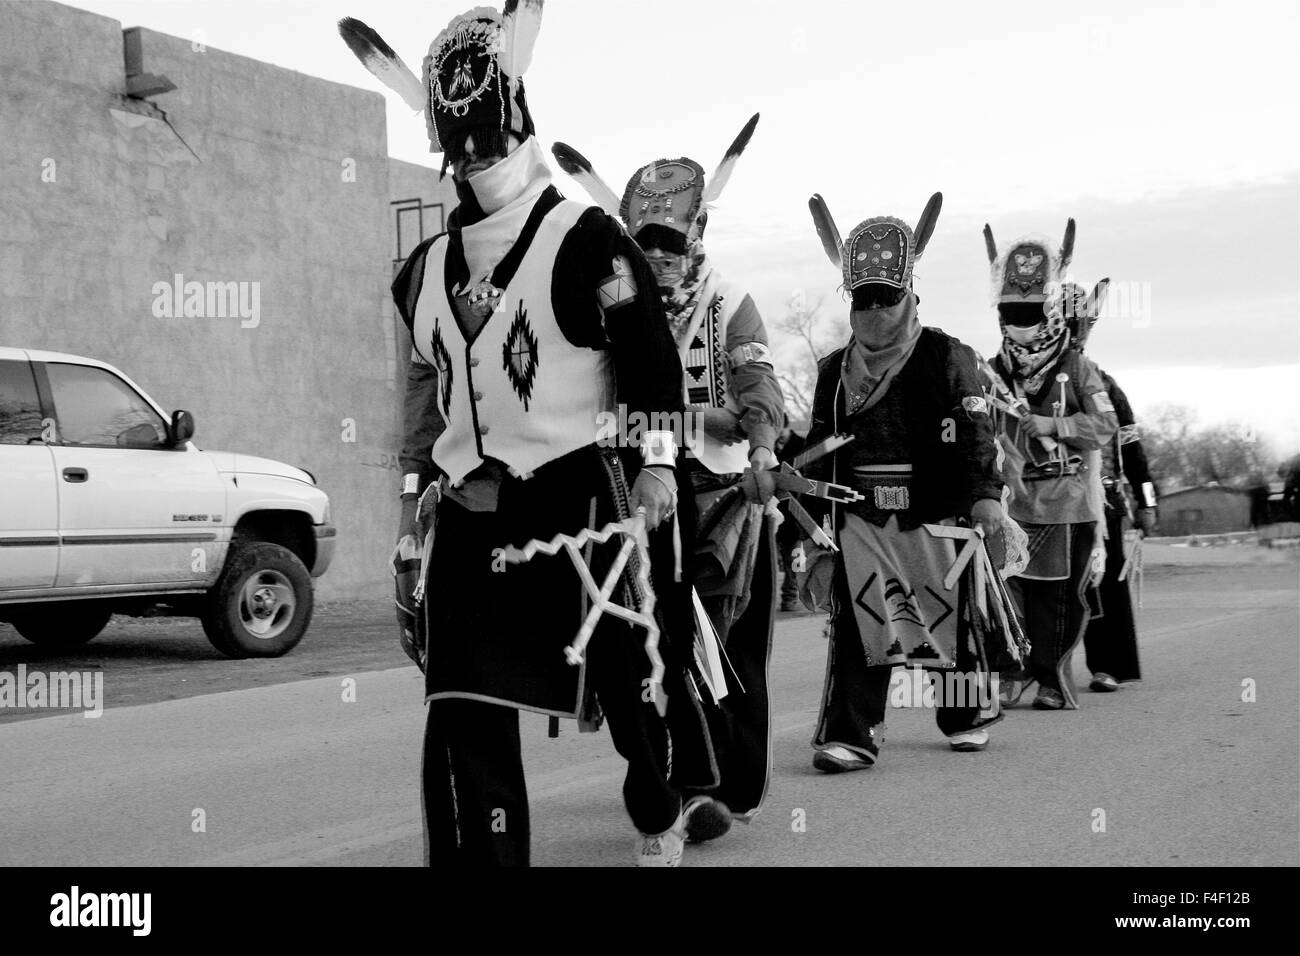 Ohkay Owingeh Pueblo, New Mexico. Matachine dancers, Christmas eve